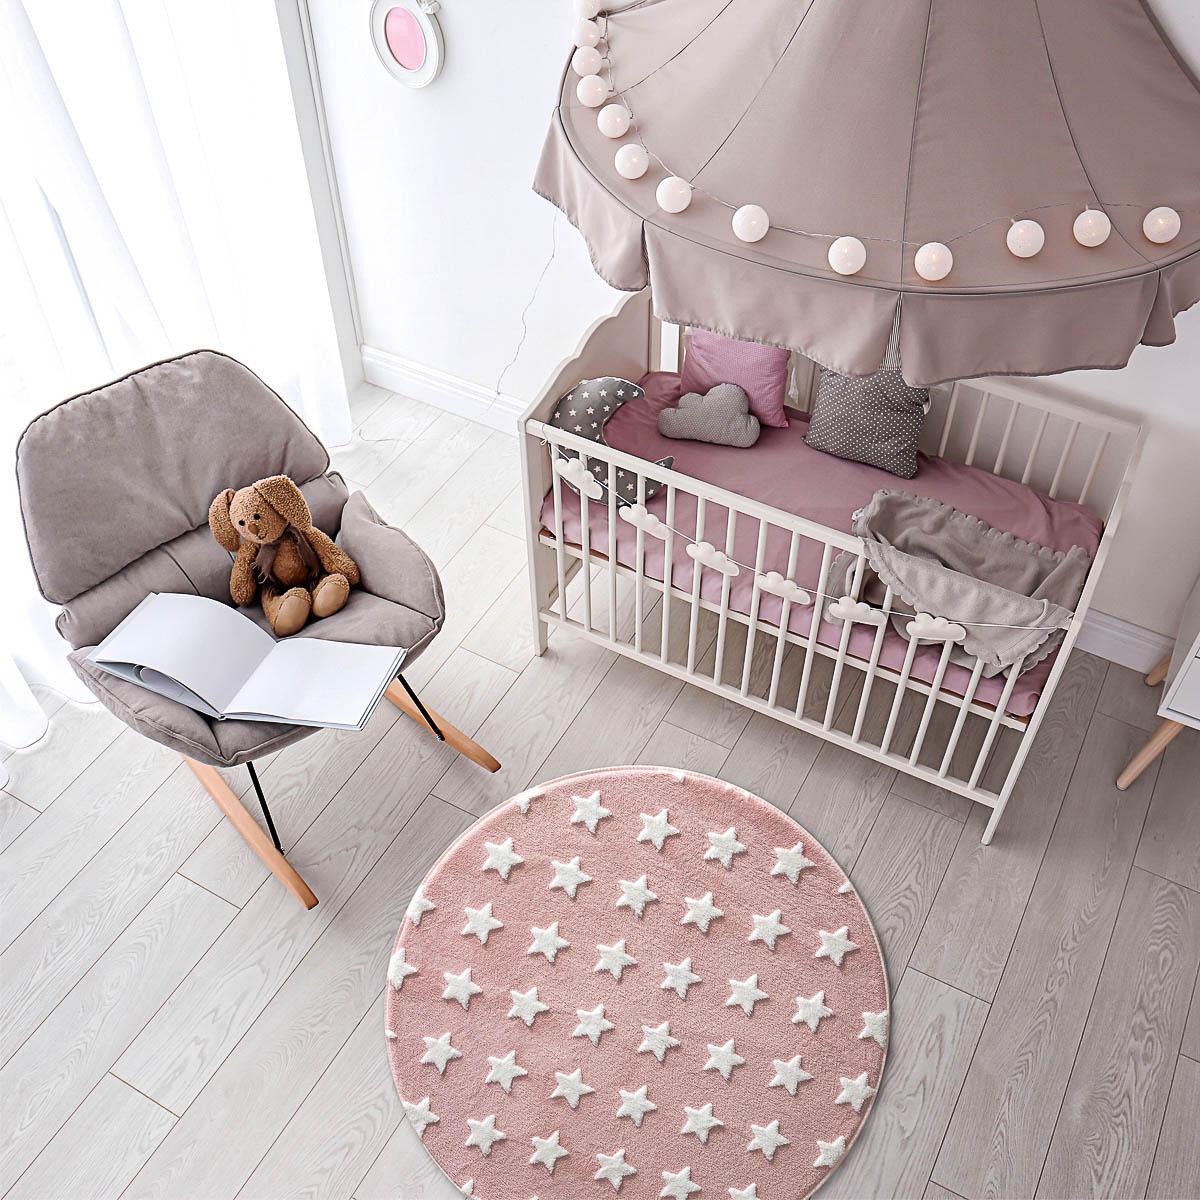 Tapete Infantil Quarto Bebe Antiderrapante Jolitex Mimo Redondo Estrelas Rosa Menina